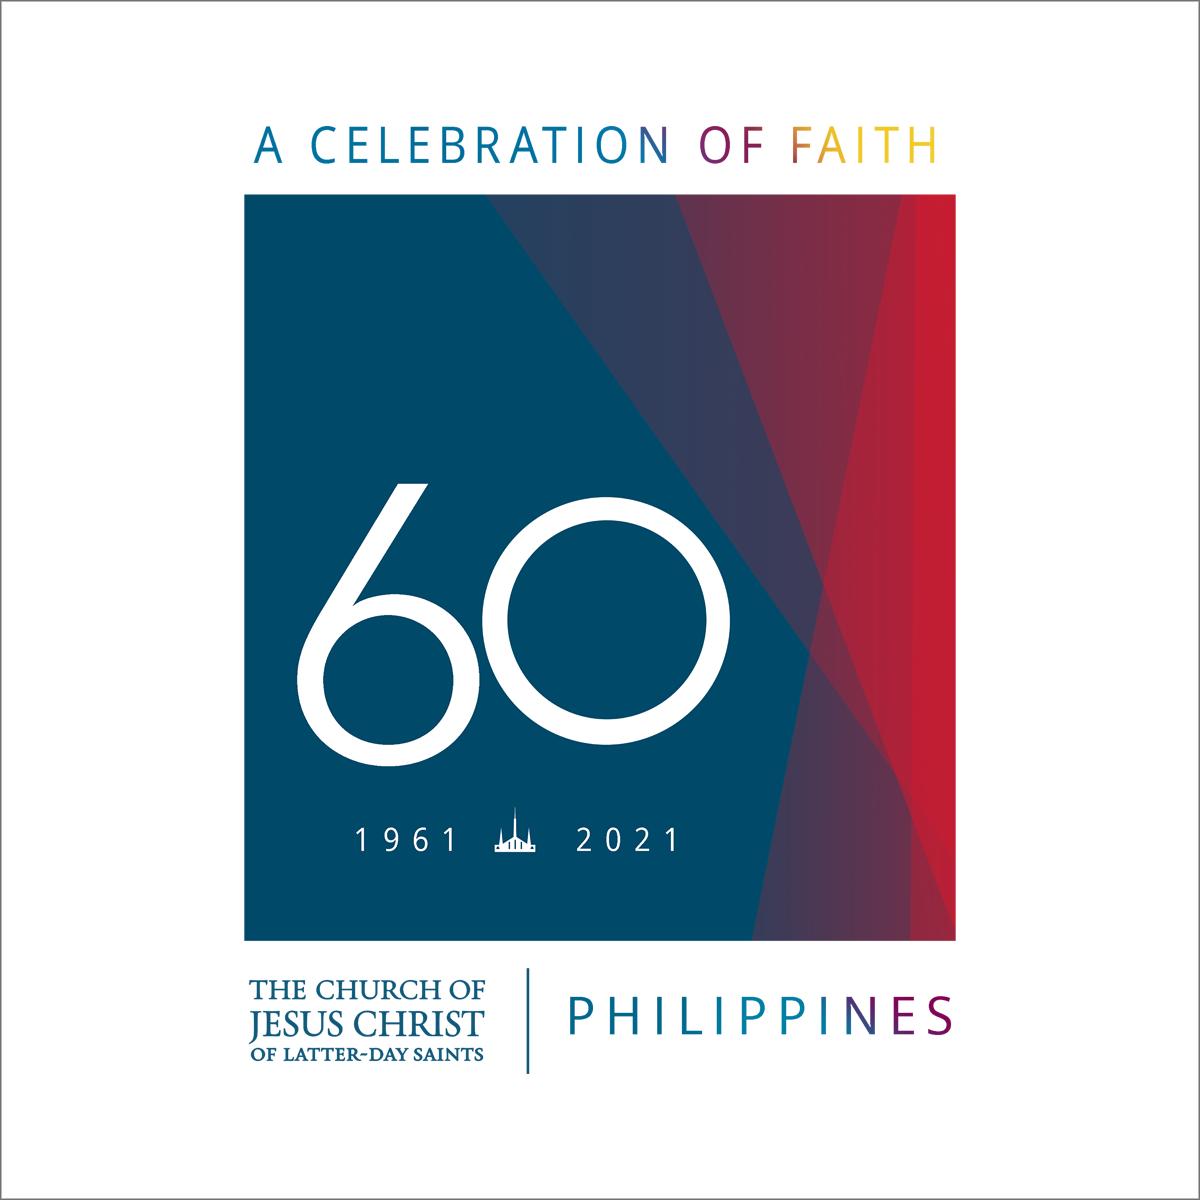 Unique symbol for the 60th anniversary of the Church